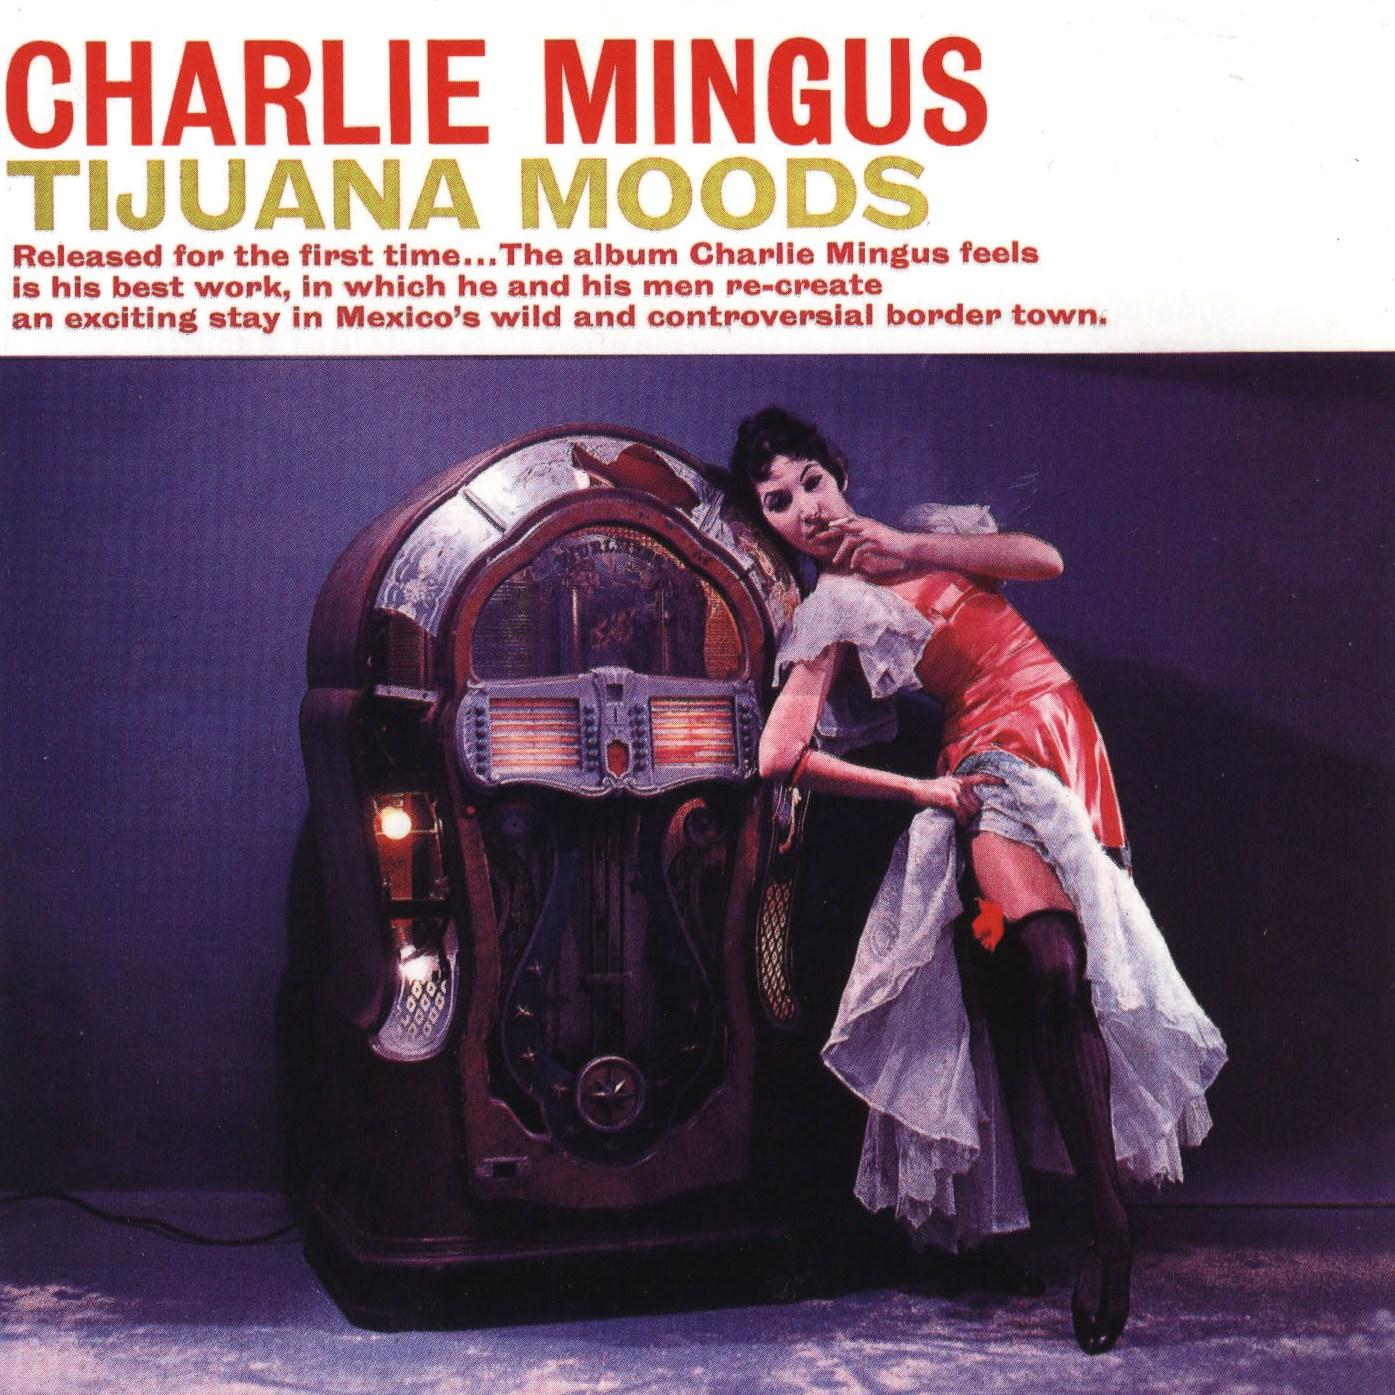 Charles Mingus - Mingus